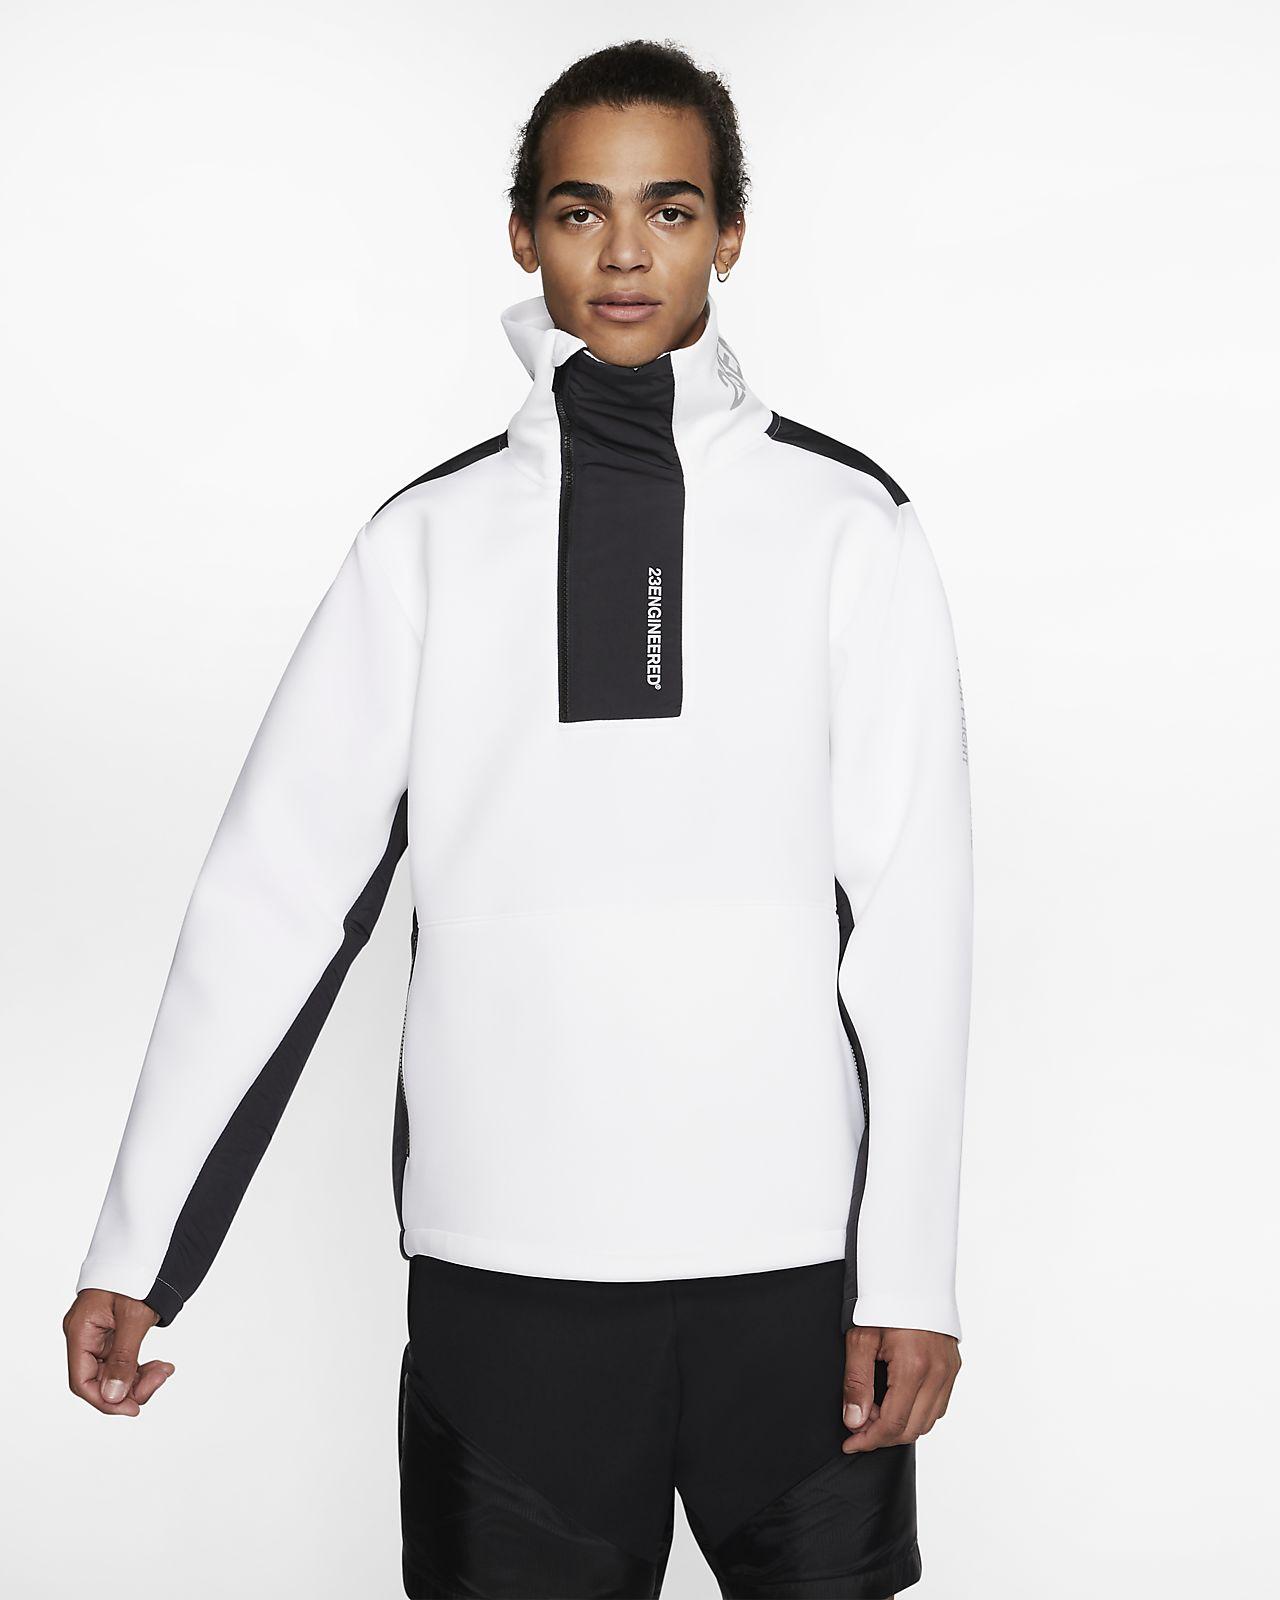 Jordan 23 Engineered Mock-Neck 男子针织套头衫